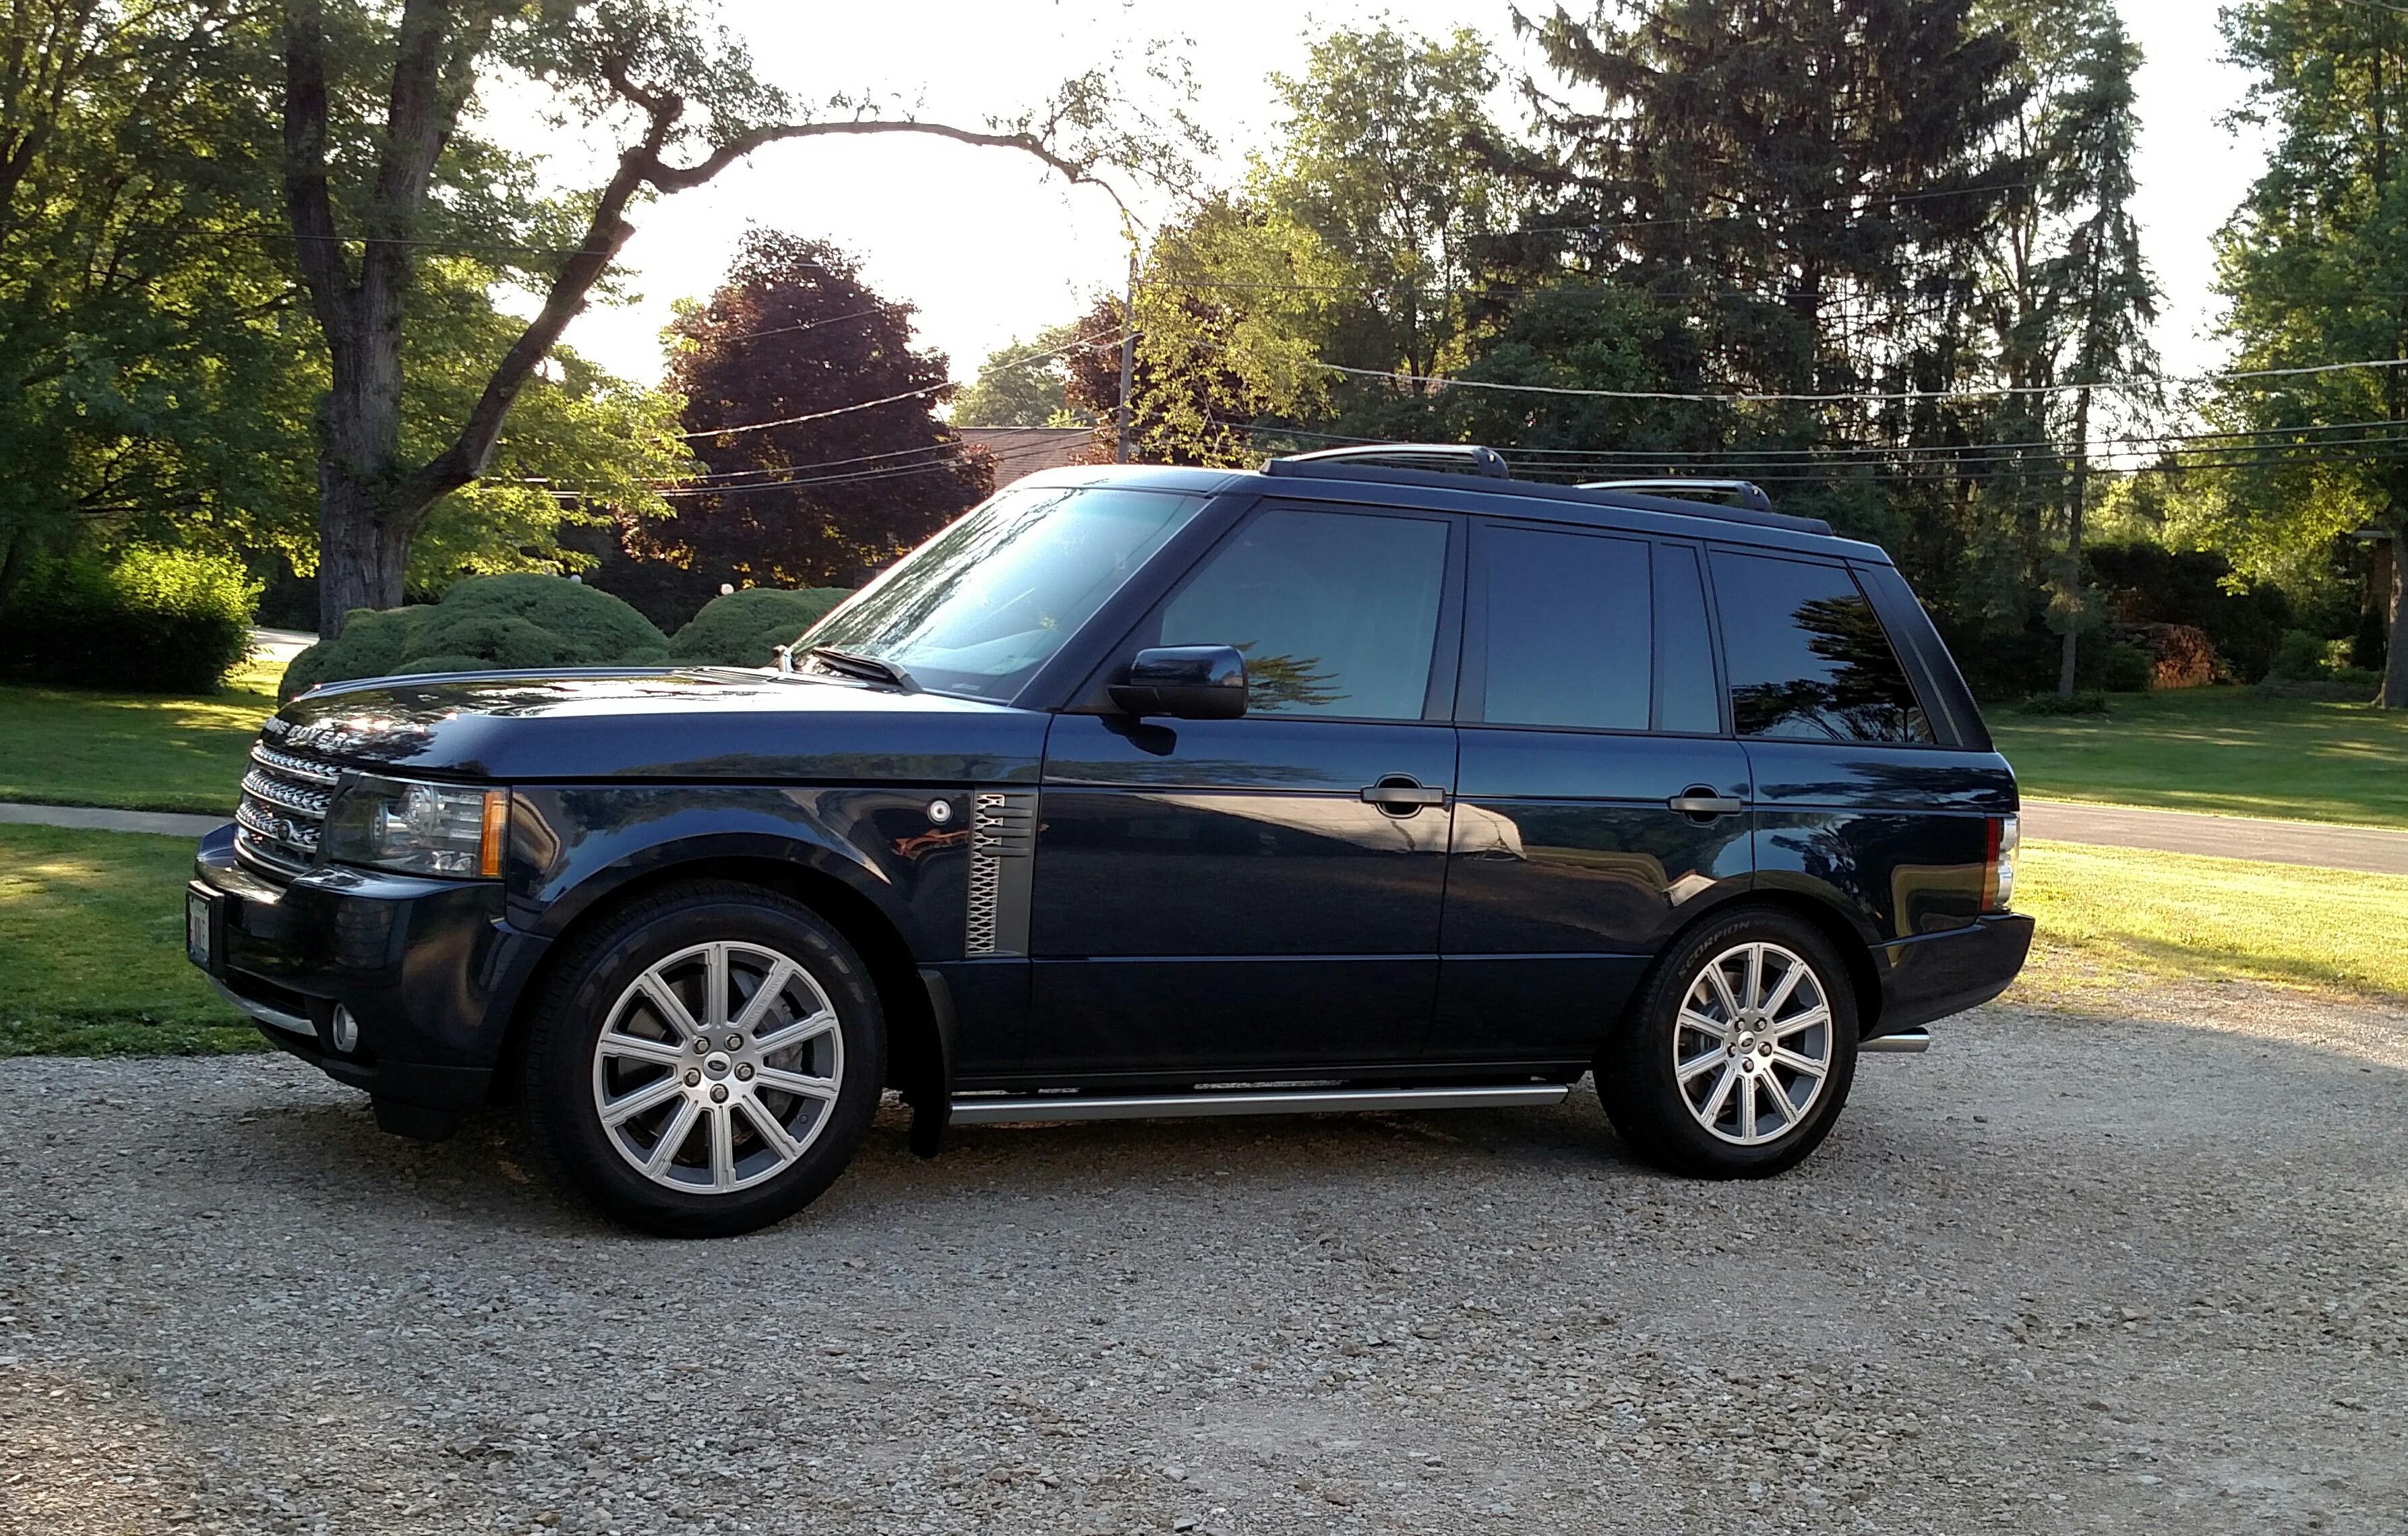 2010-2012 Range Rover S/C - Brake Pad Life & Suggestions-img_20160714_142704.jpg